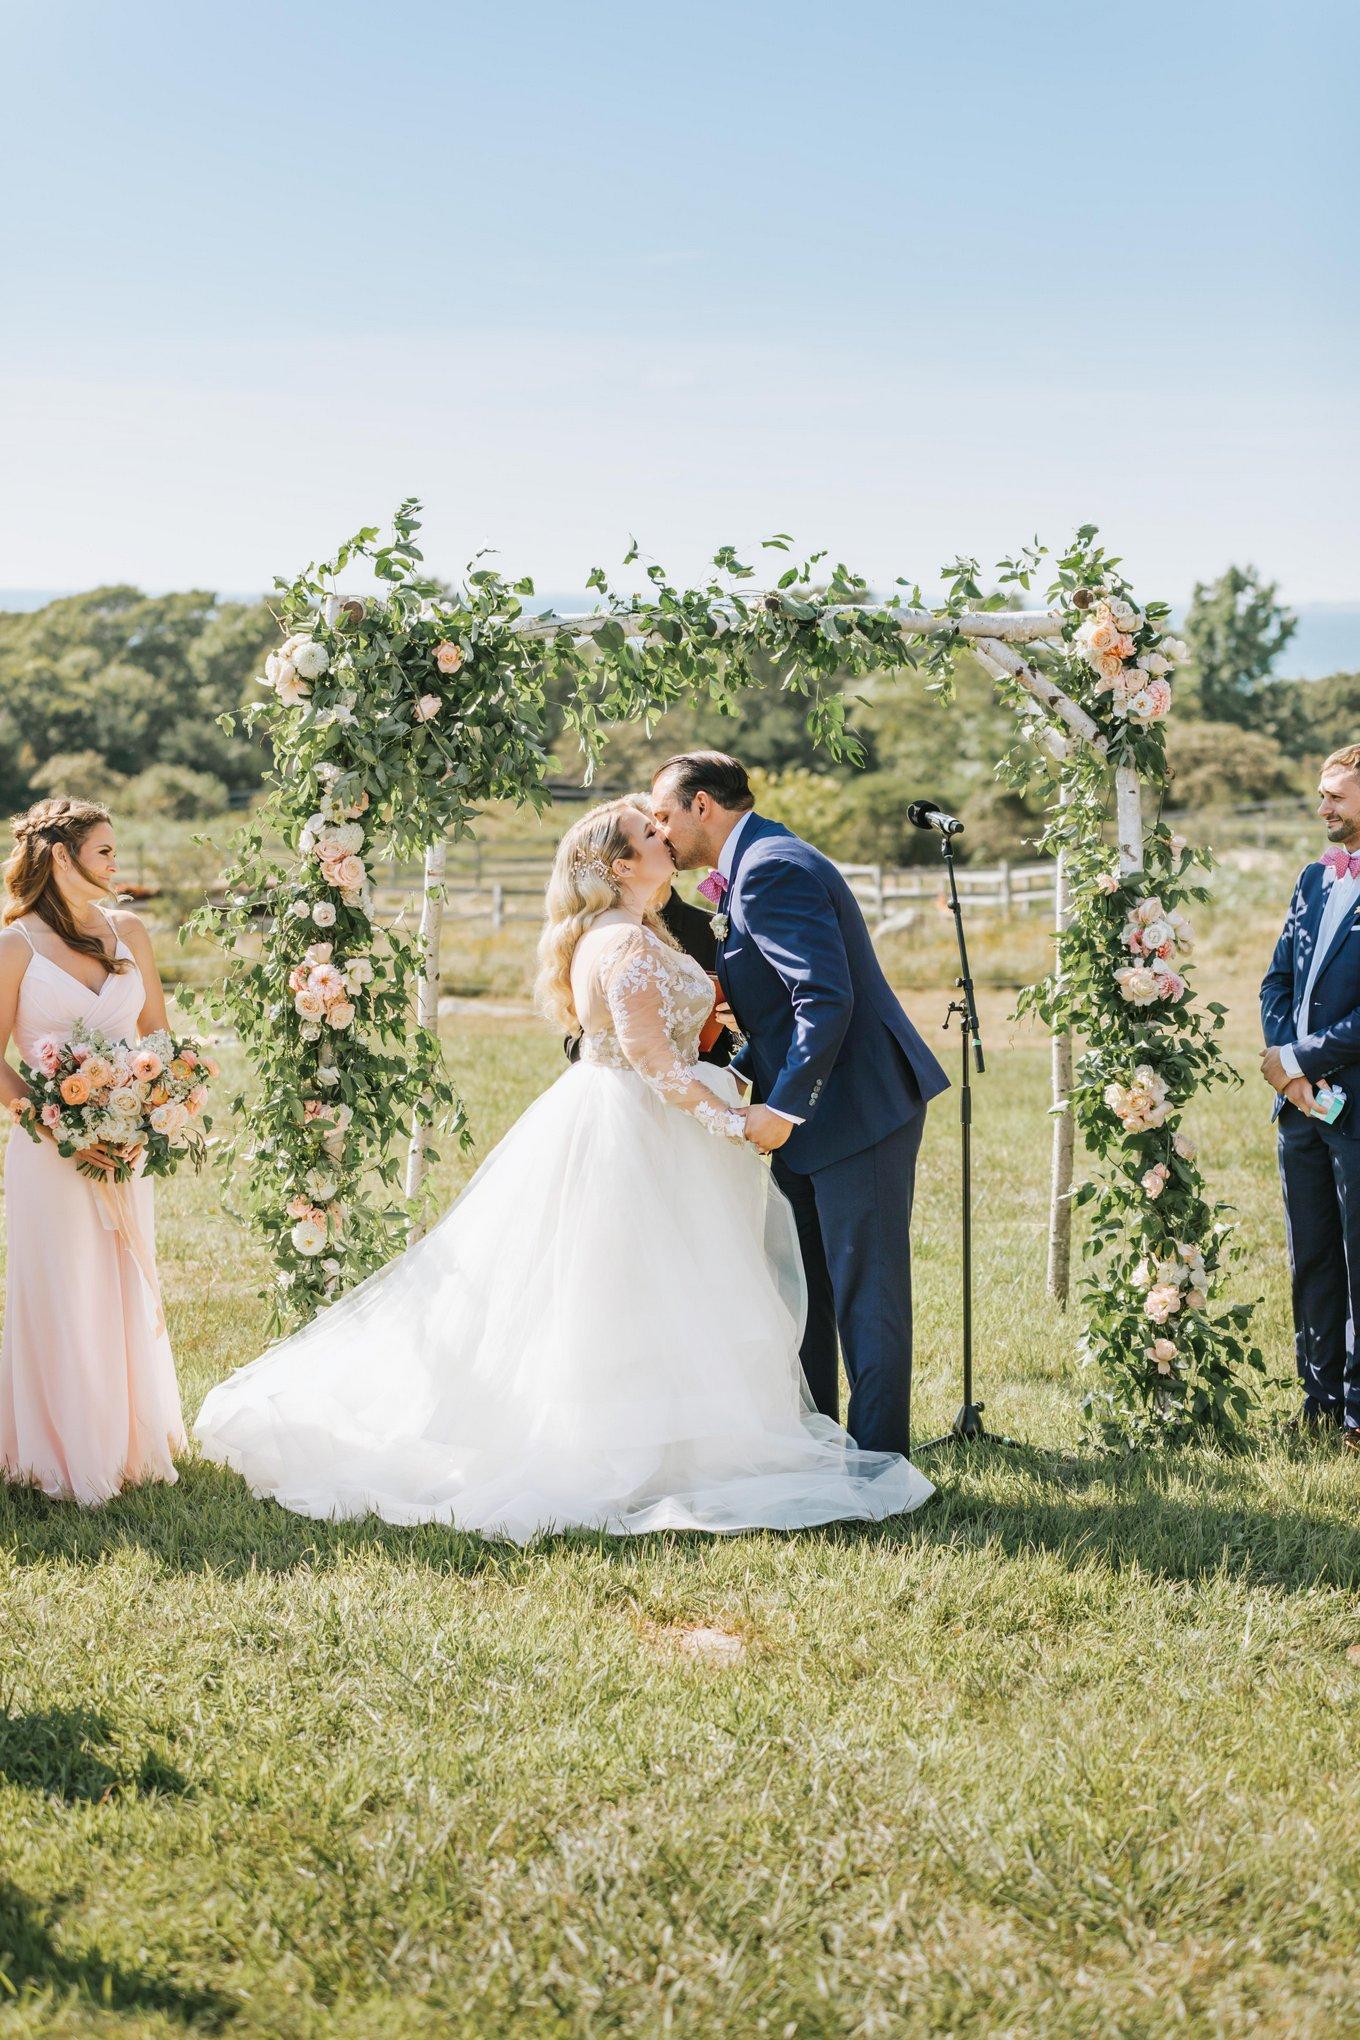 Marthas-Vineyard-Wedding-Photographer-Beach-Plum-Inn-22.jpg